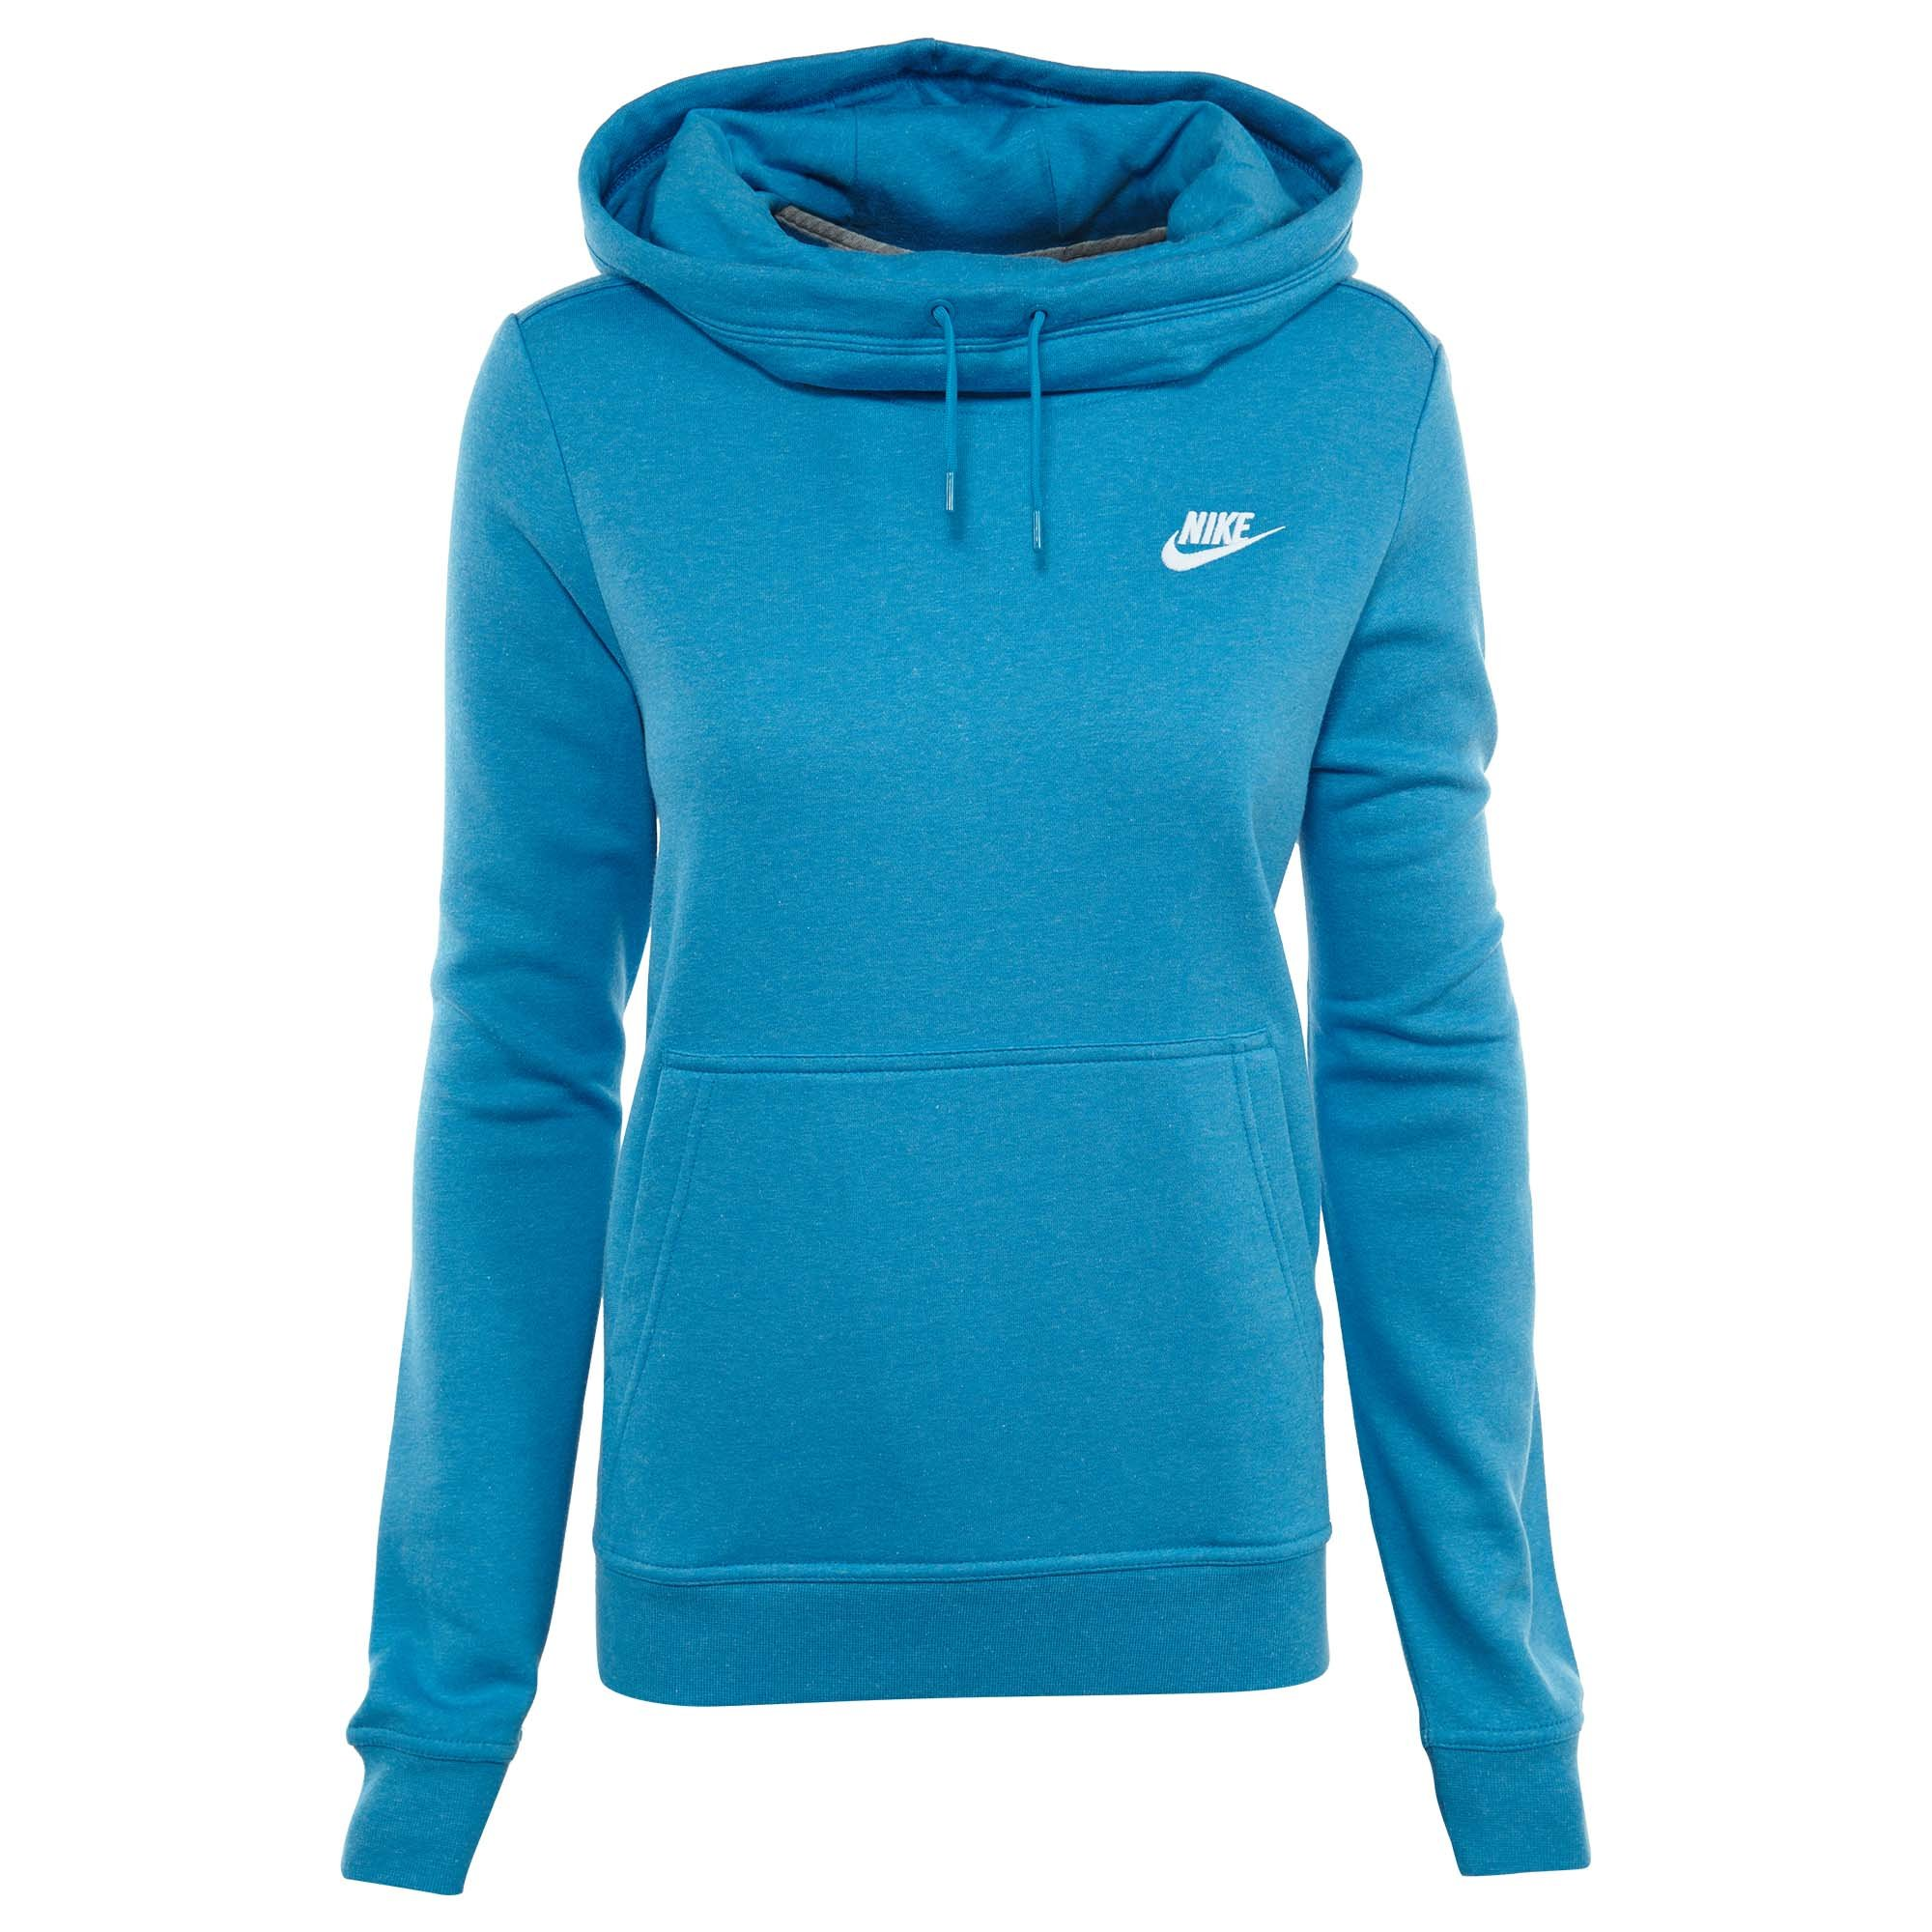 Nike Club Funnel Hoodie Womens Style: 853928-437 Size: M